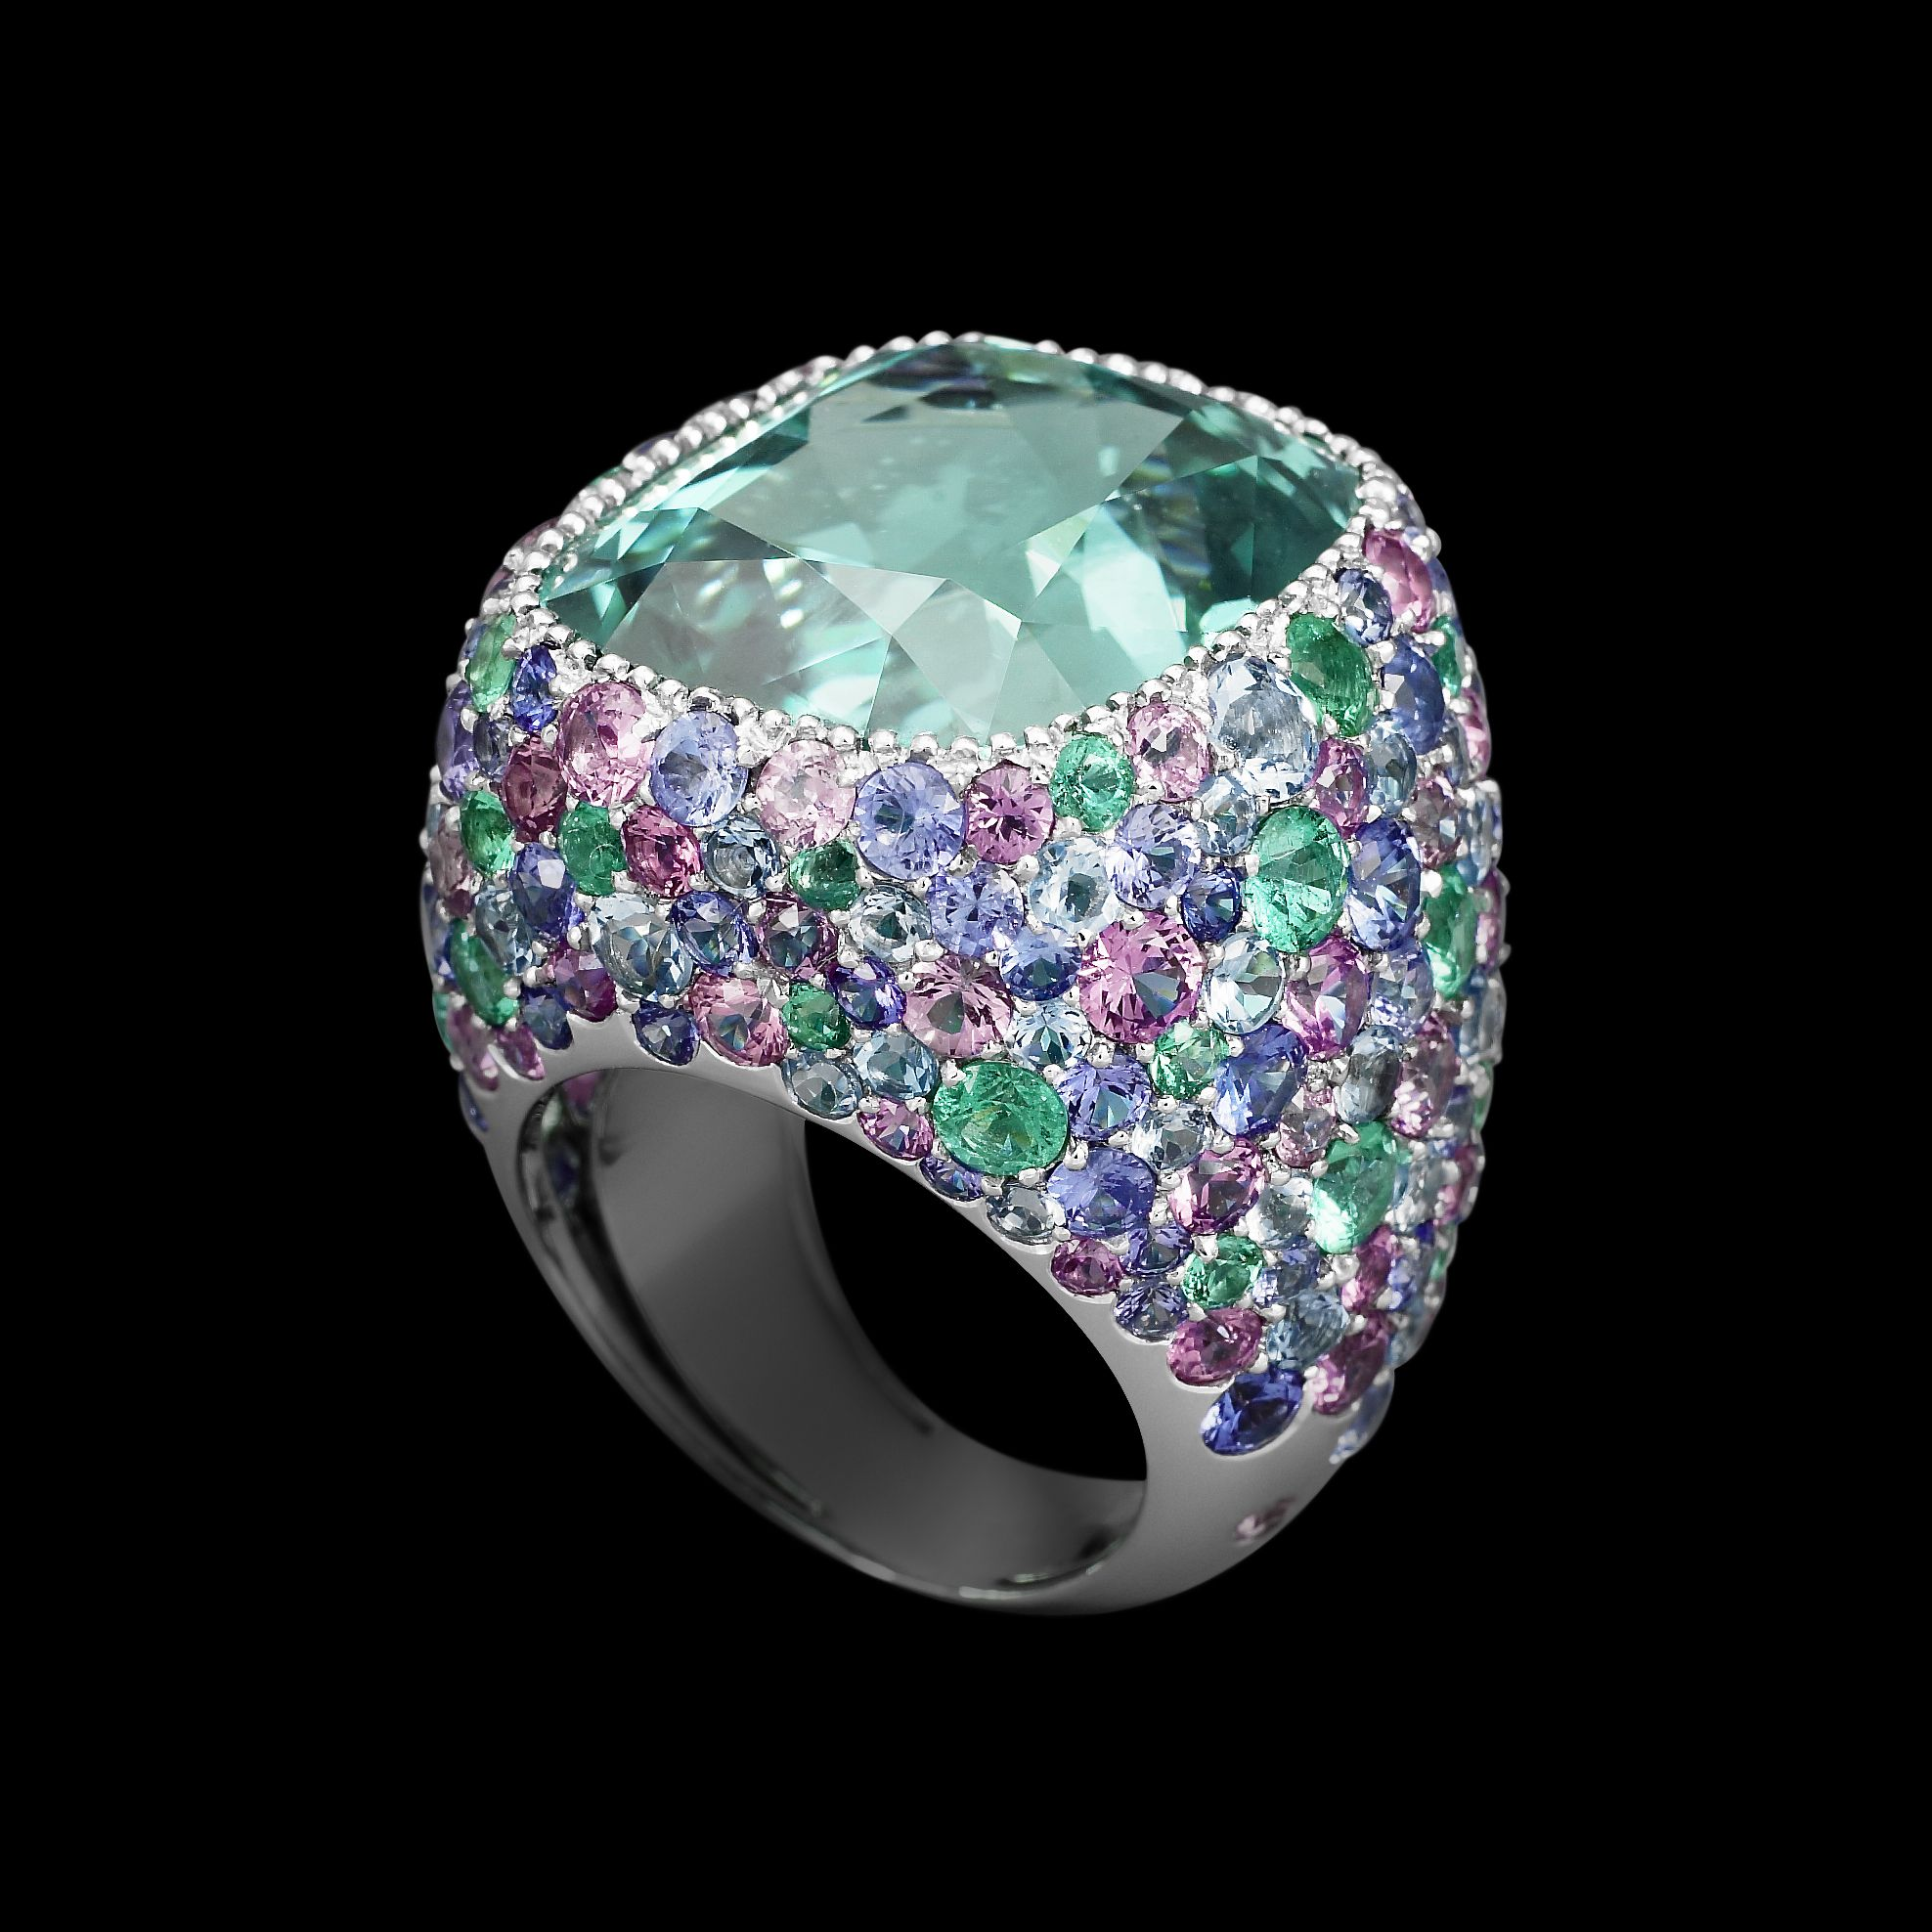 My idol Lorenz Baumer ring,